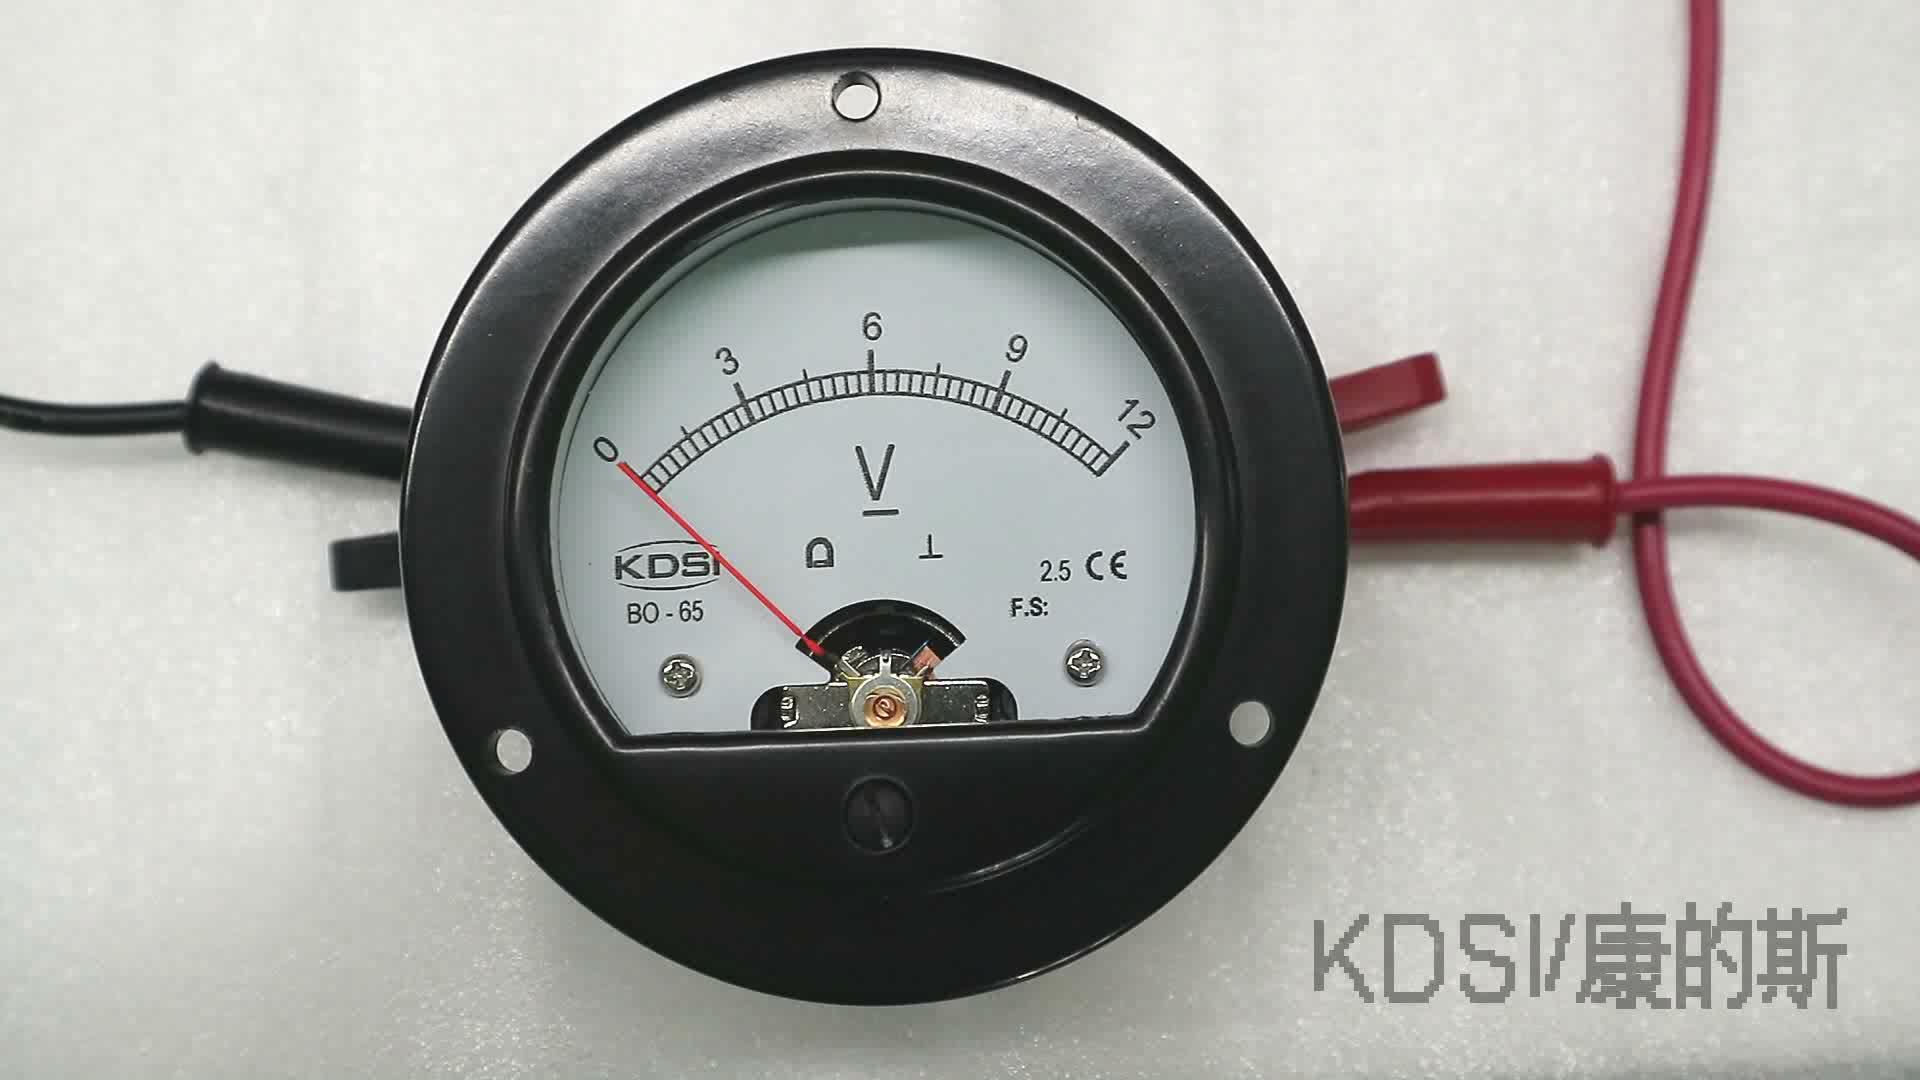 KDSI 라운드 형 BO-65 DC12V 패널 아날로그 배터리 표시